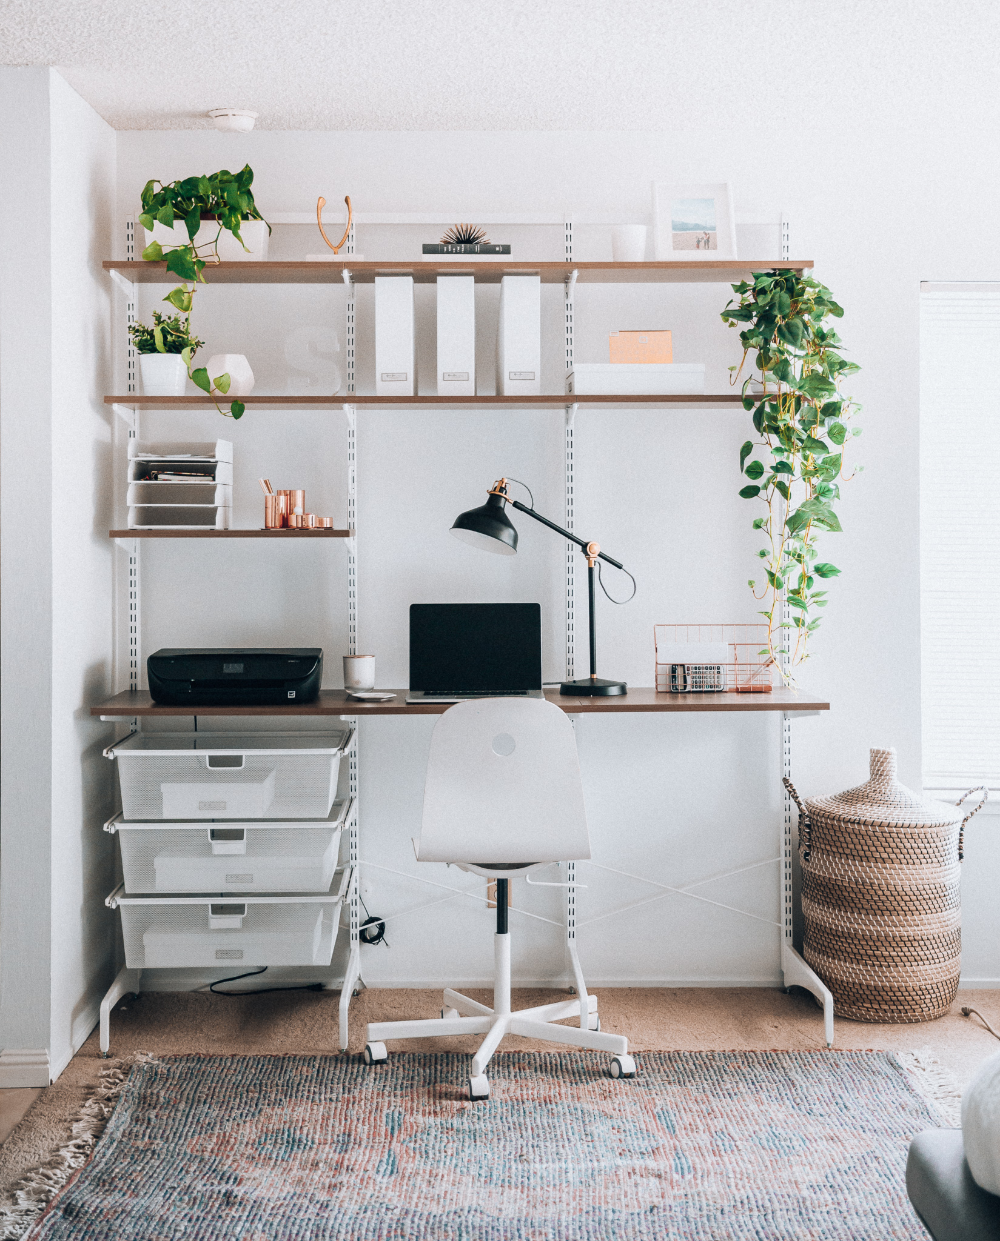 Modern Minimalist Home Office Space Ideas The Girl In The Yellow Dress Modern Home Office Interior Design Living Room Study Room Decor